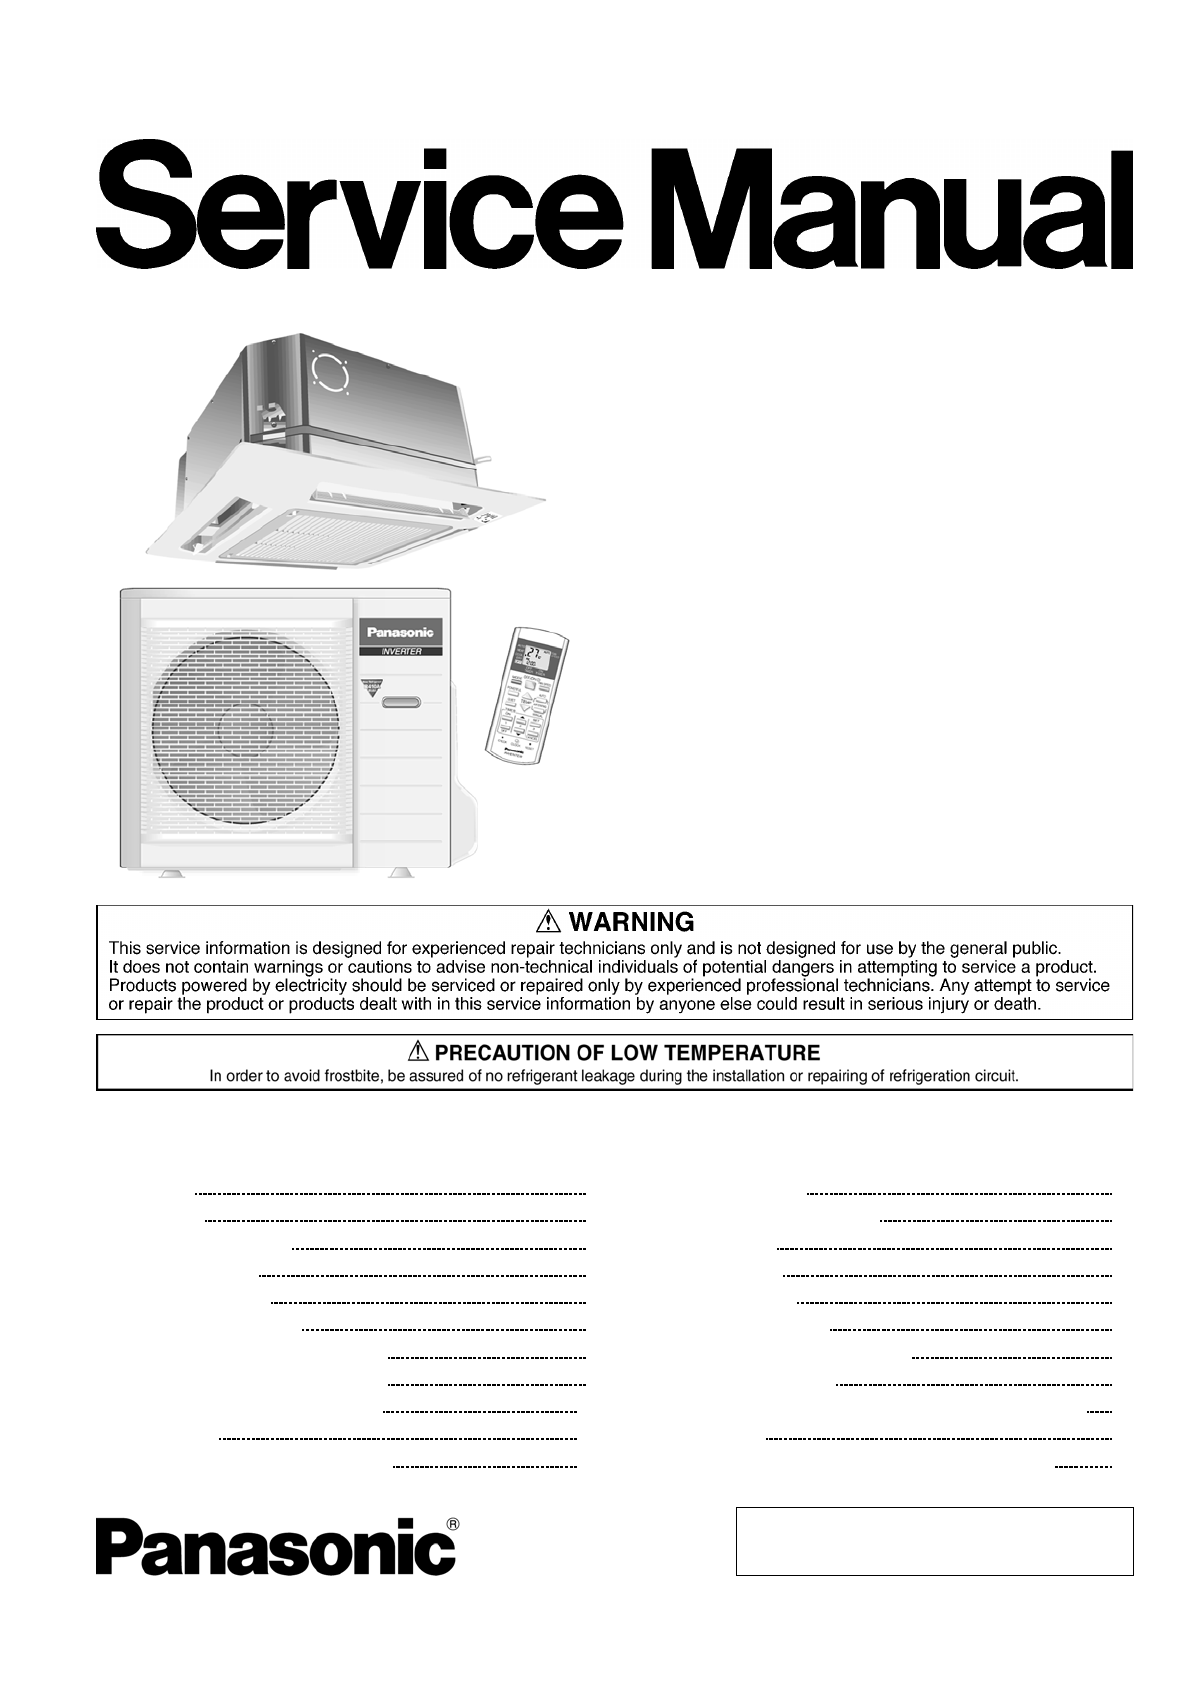 philips cs e15db4ew users manual panasonic air conditioner